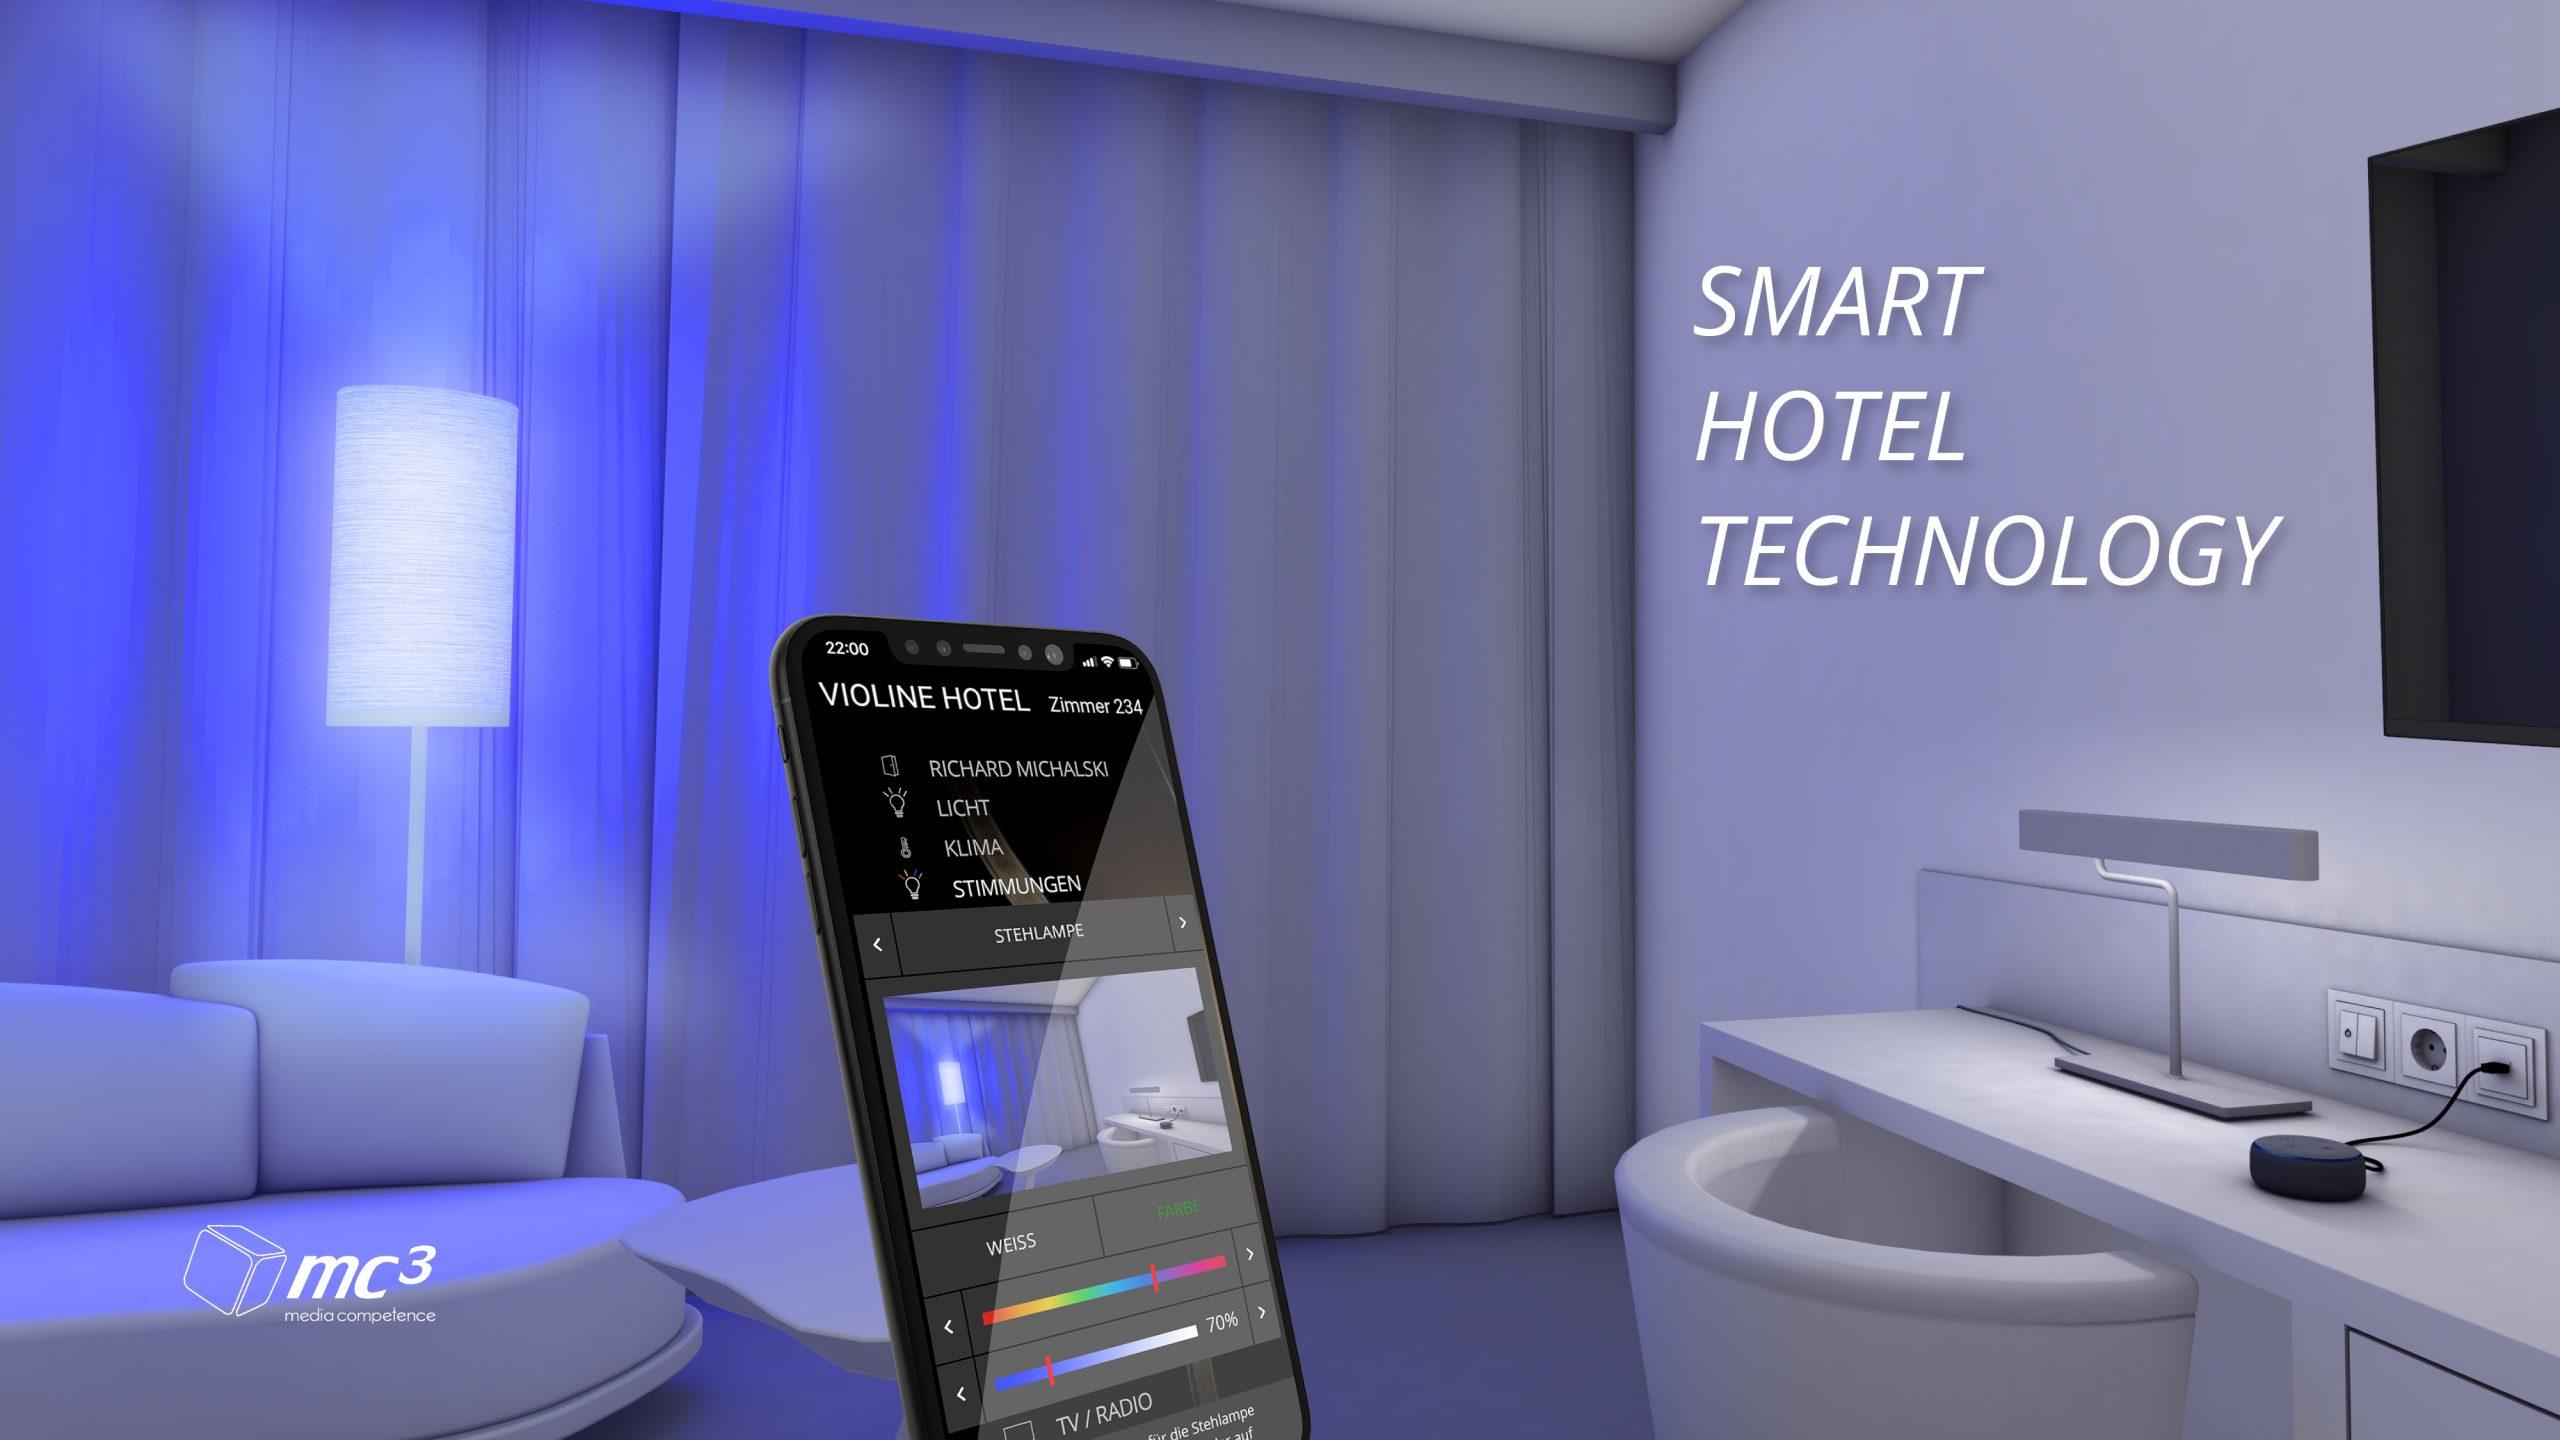 Smart Hotel Technology, Digital Guest Communication, Digital Hotel Signage